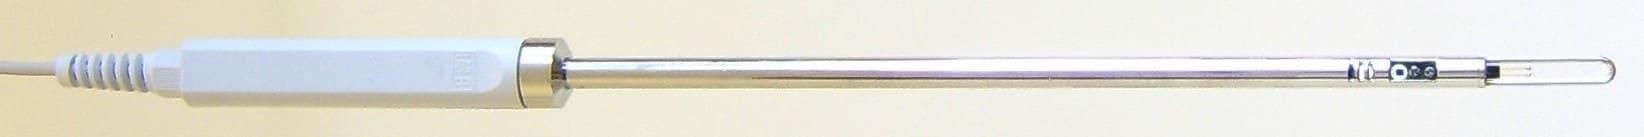 Termo-anemometr LB-582